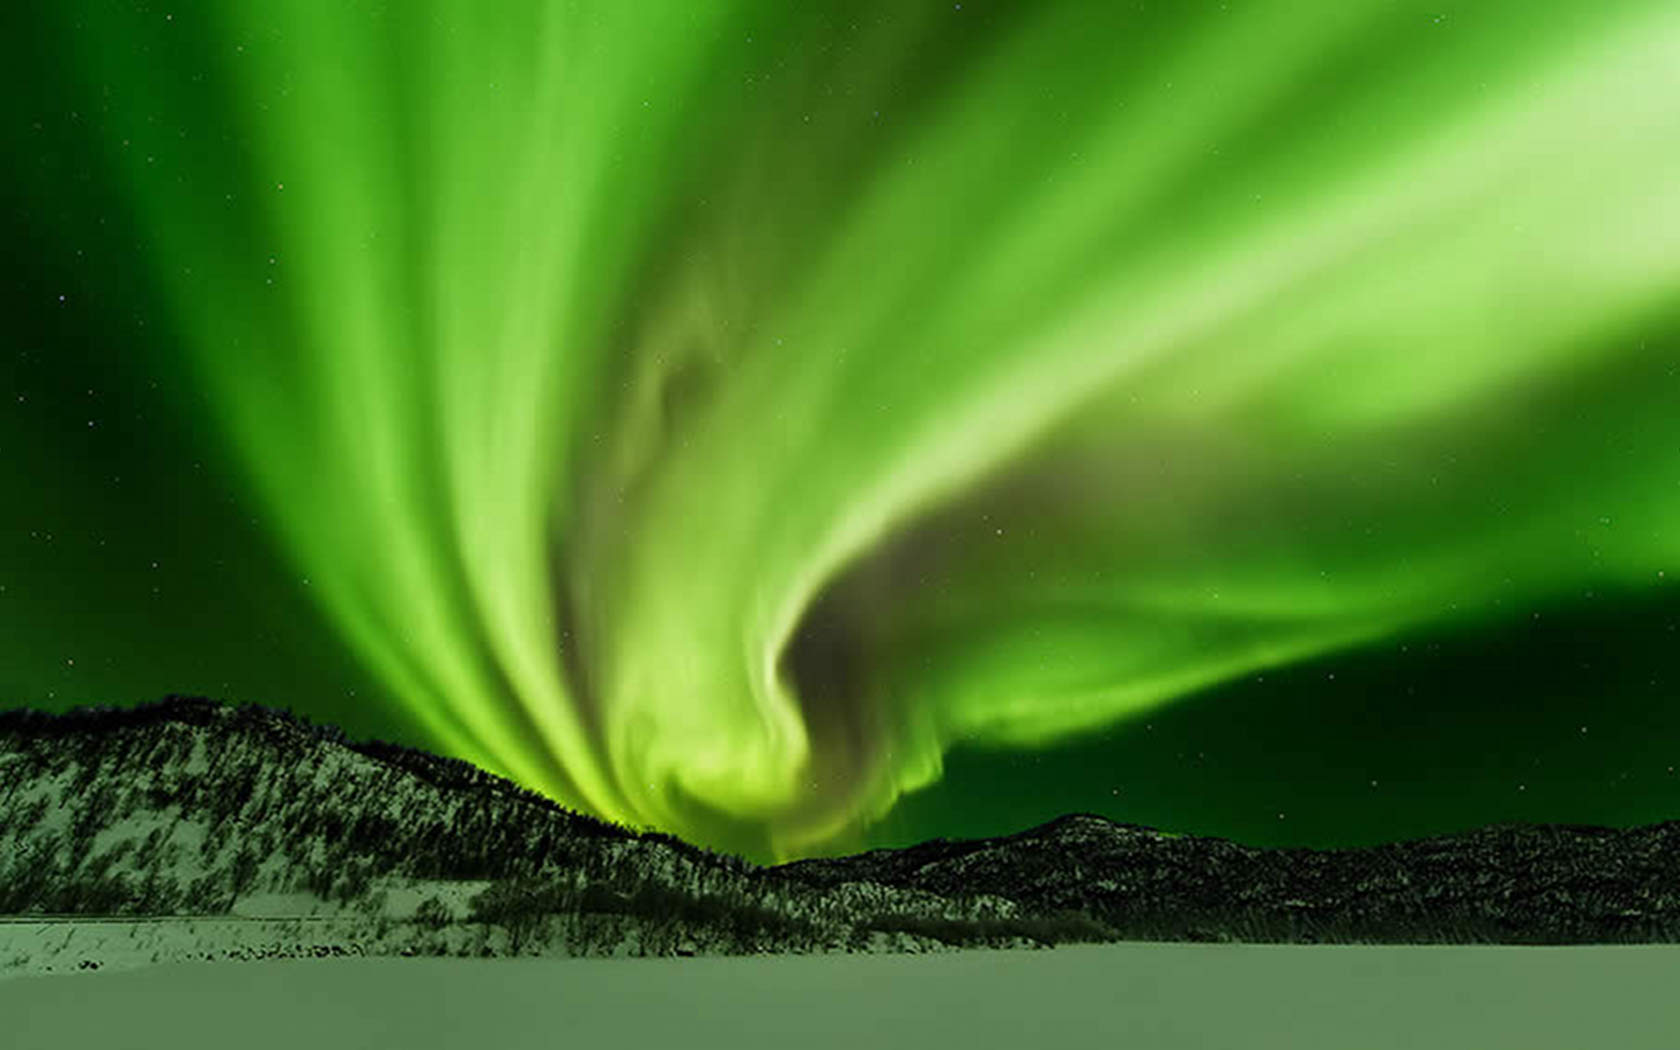 Aurora Borealis Wallpaper hd - HD Wallpapers